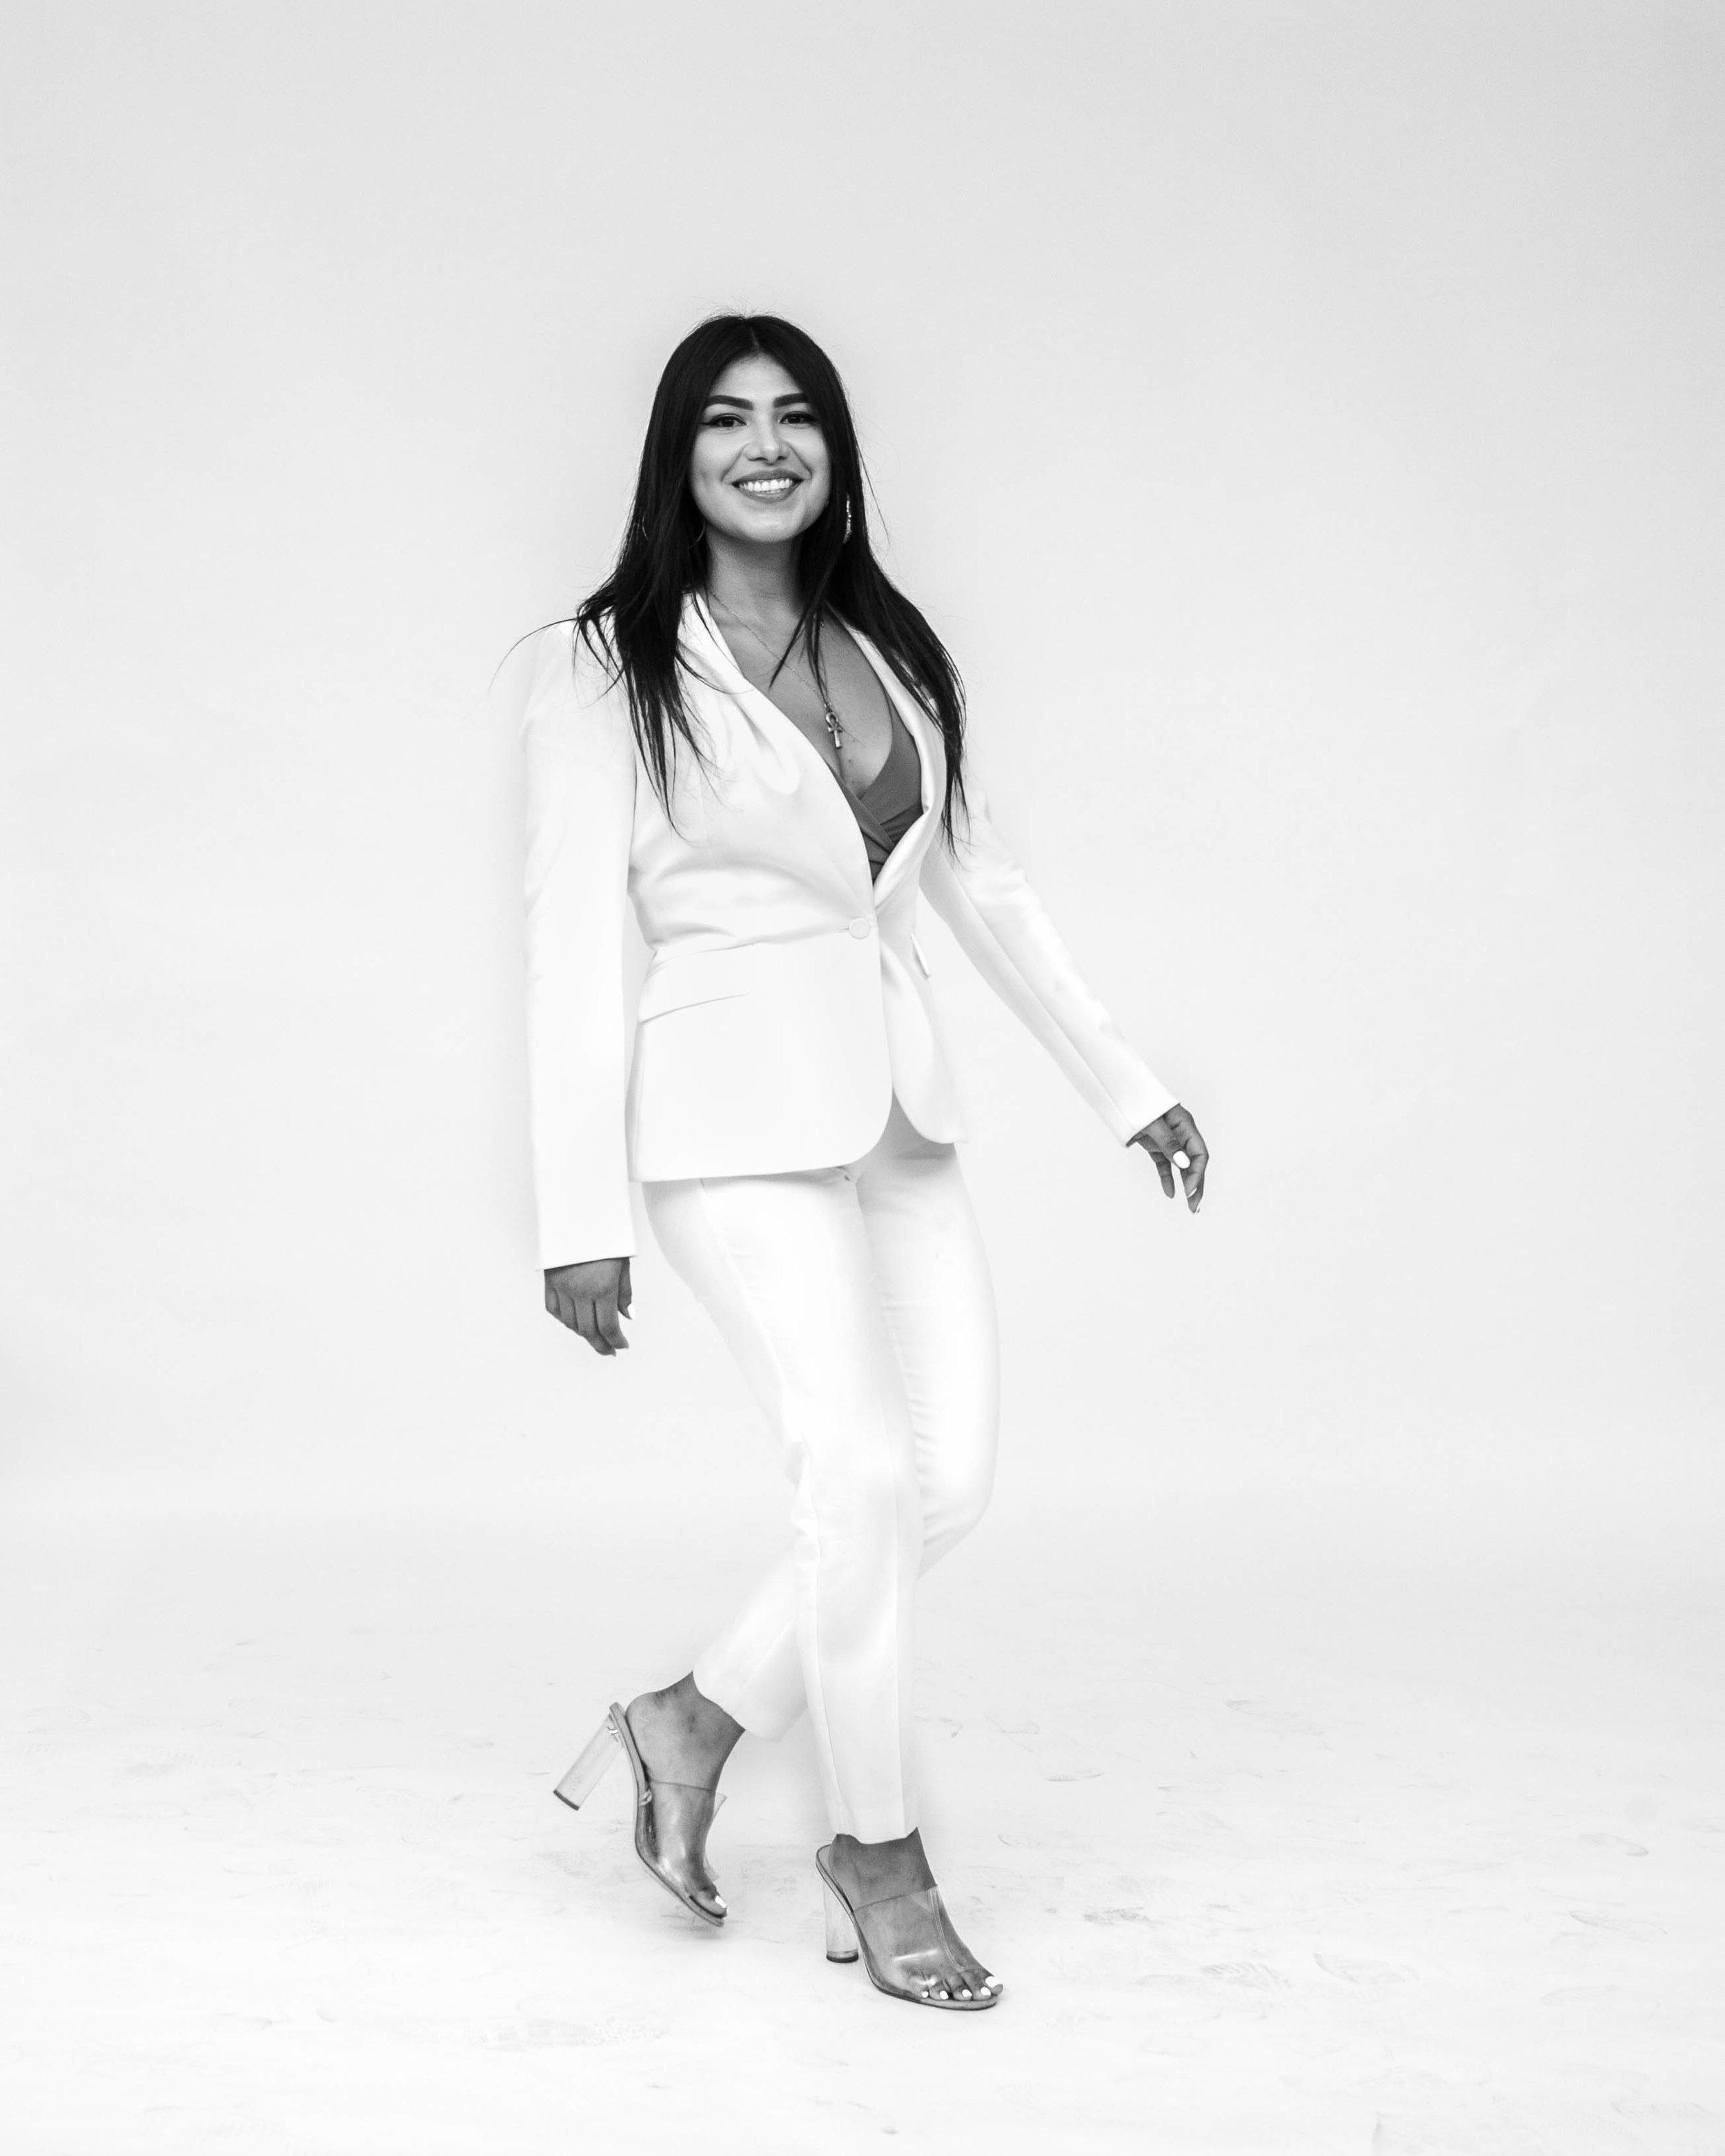 Alicia Rangel